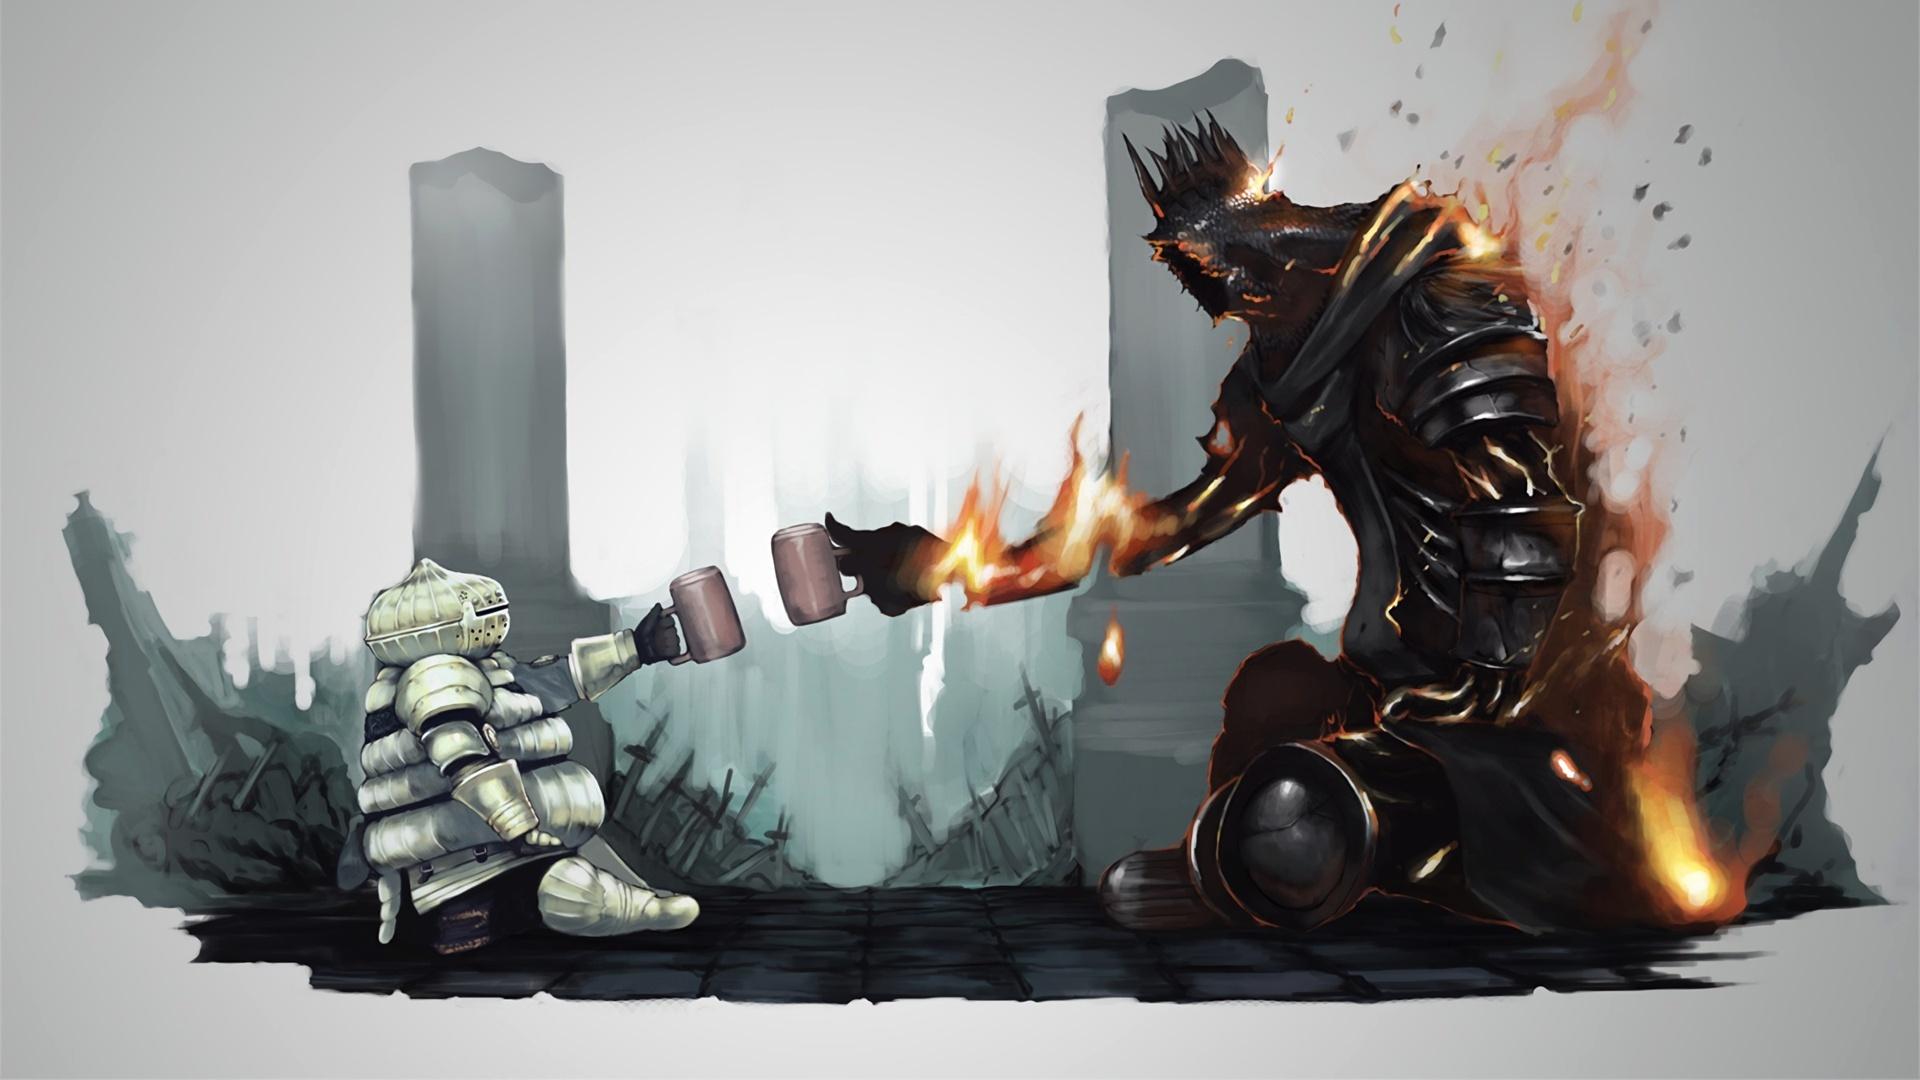 Dark Souls background picture